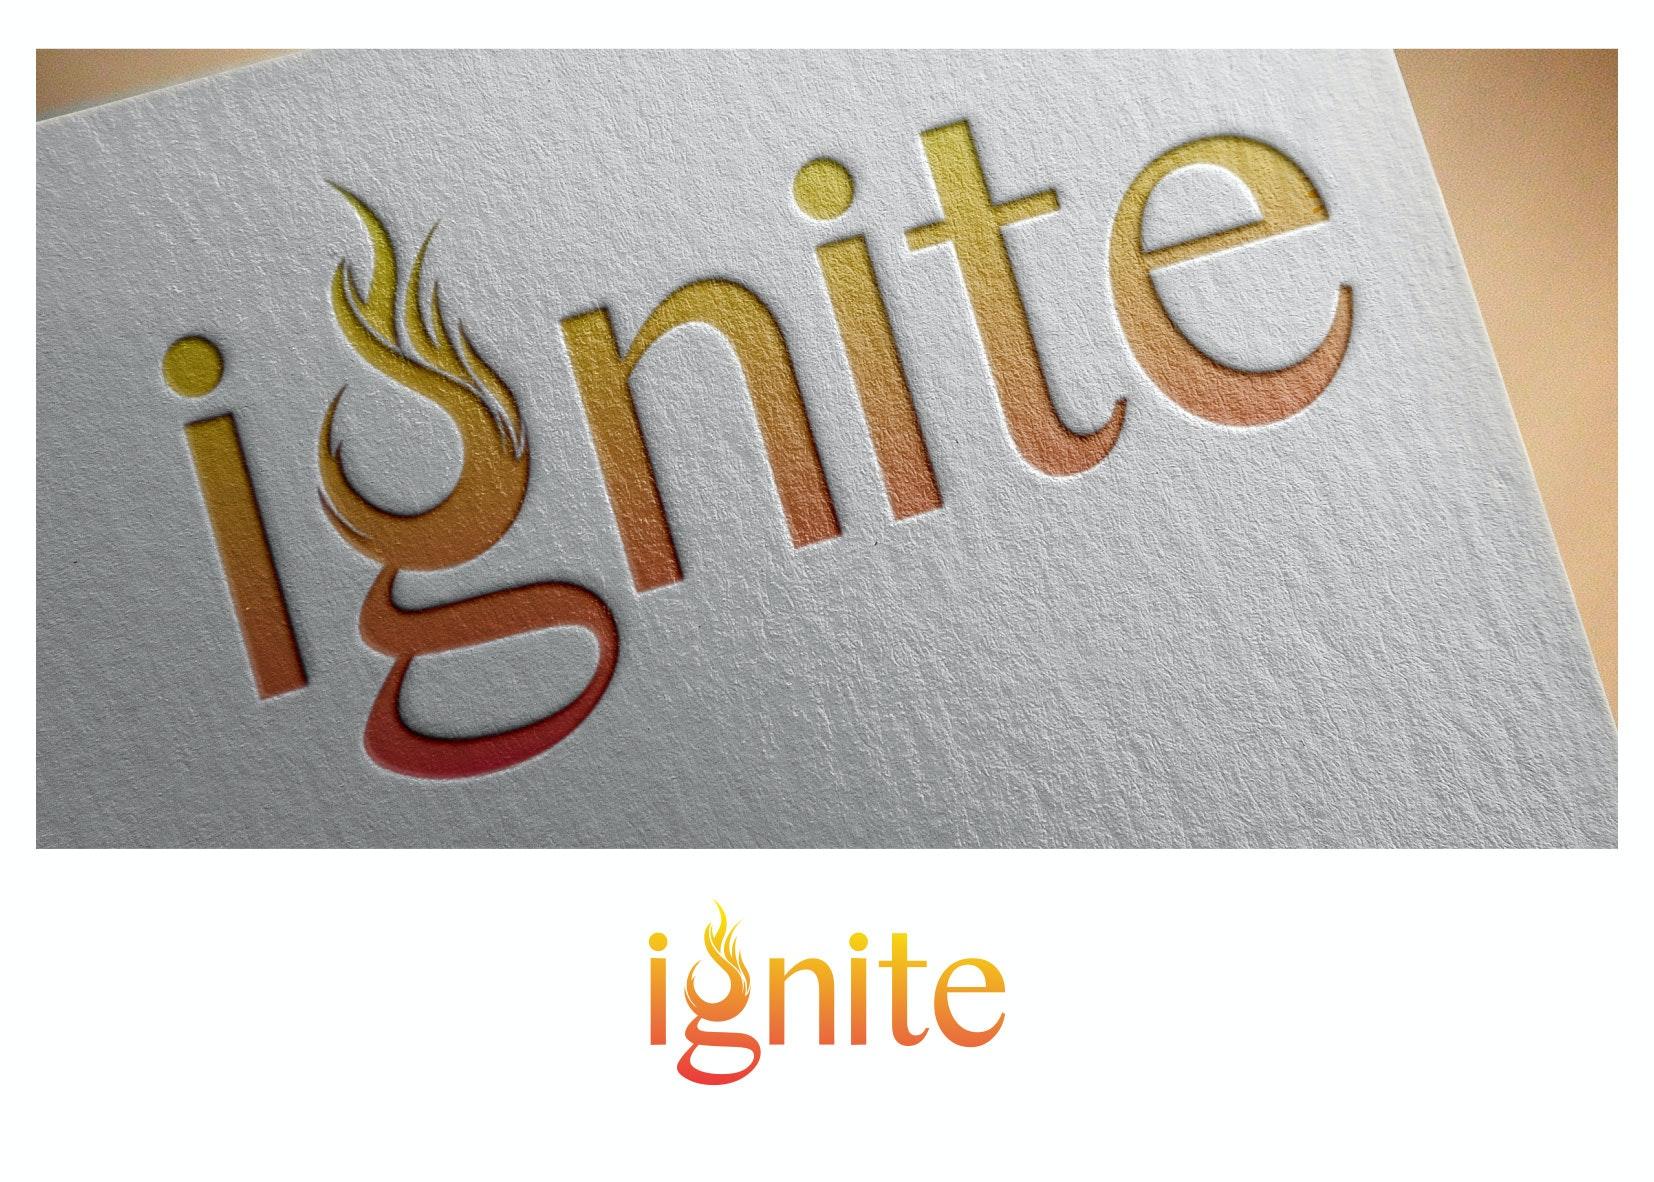 9 ignite logo entwurf